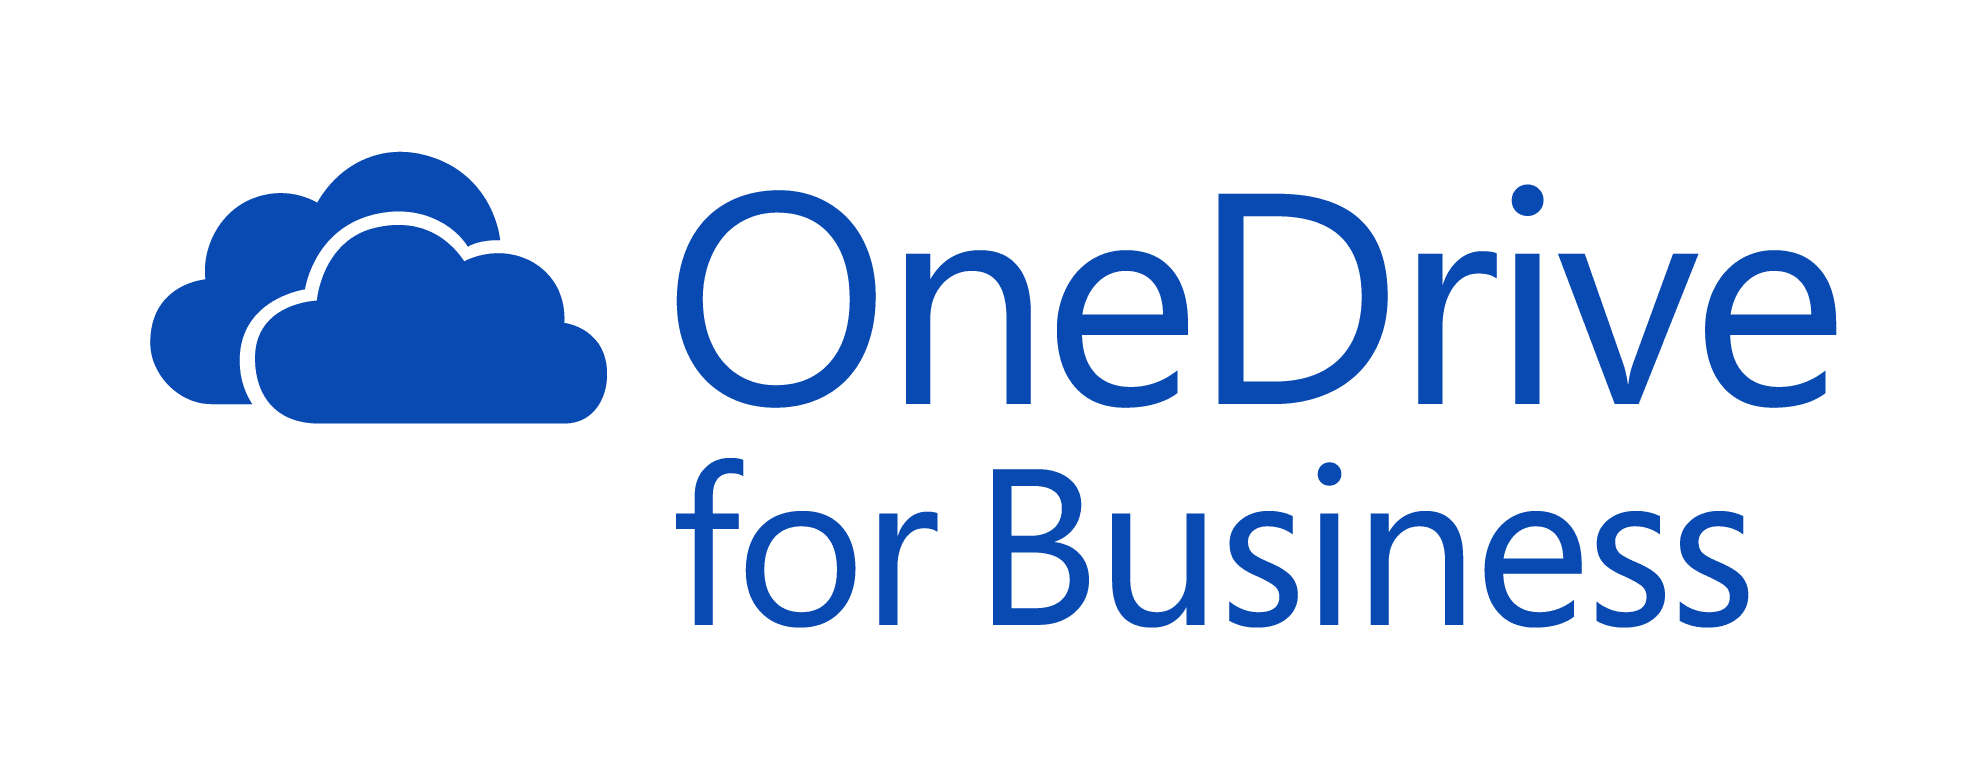 OneDrive-For-Business-biz-large-logo-high-resolution-transparent-alpha-channel-png-file-press